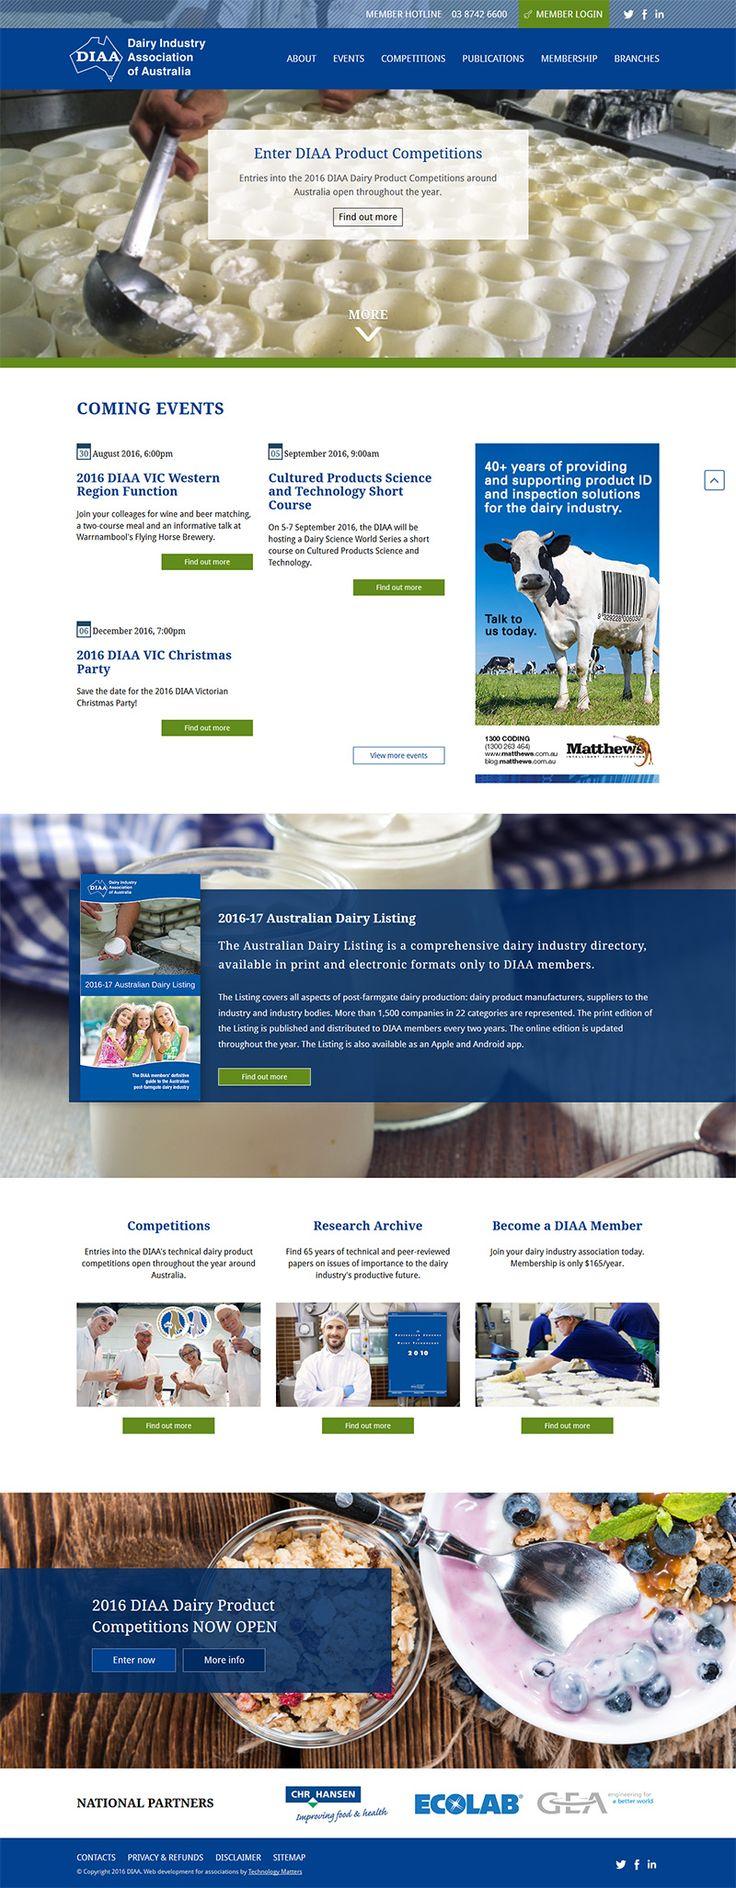 OUR PORTFOLIO Dairy Industry Association of Australia -Technology Matters, Melbourne.